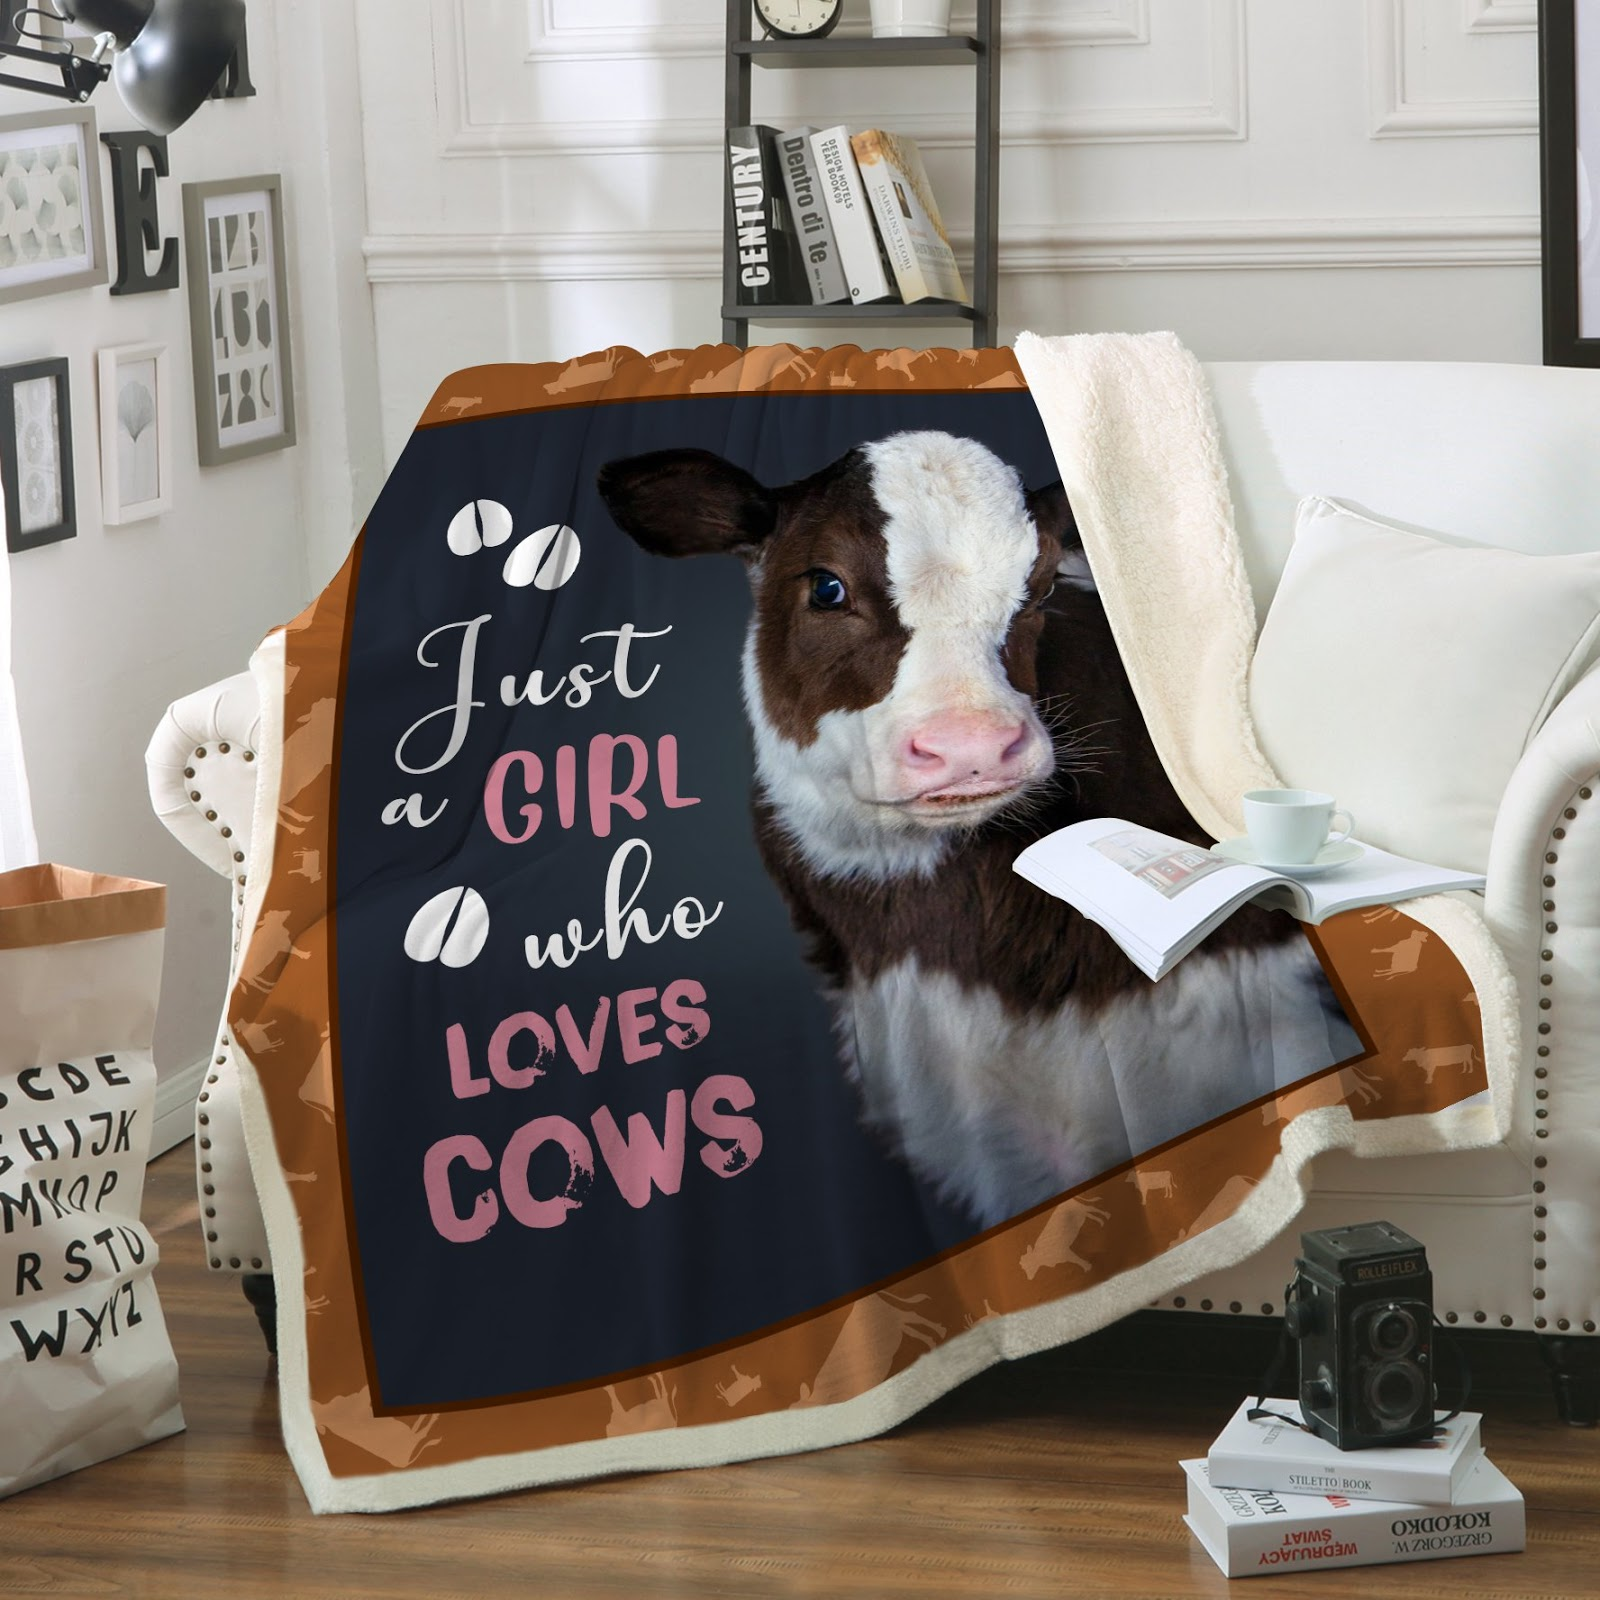 Just girl who loves cows full printing blanket 3